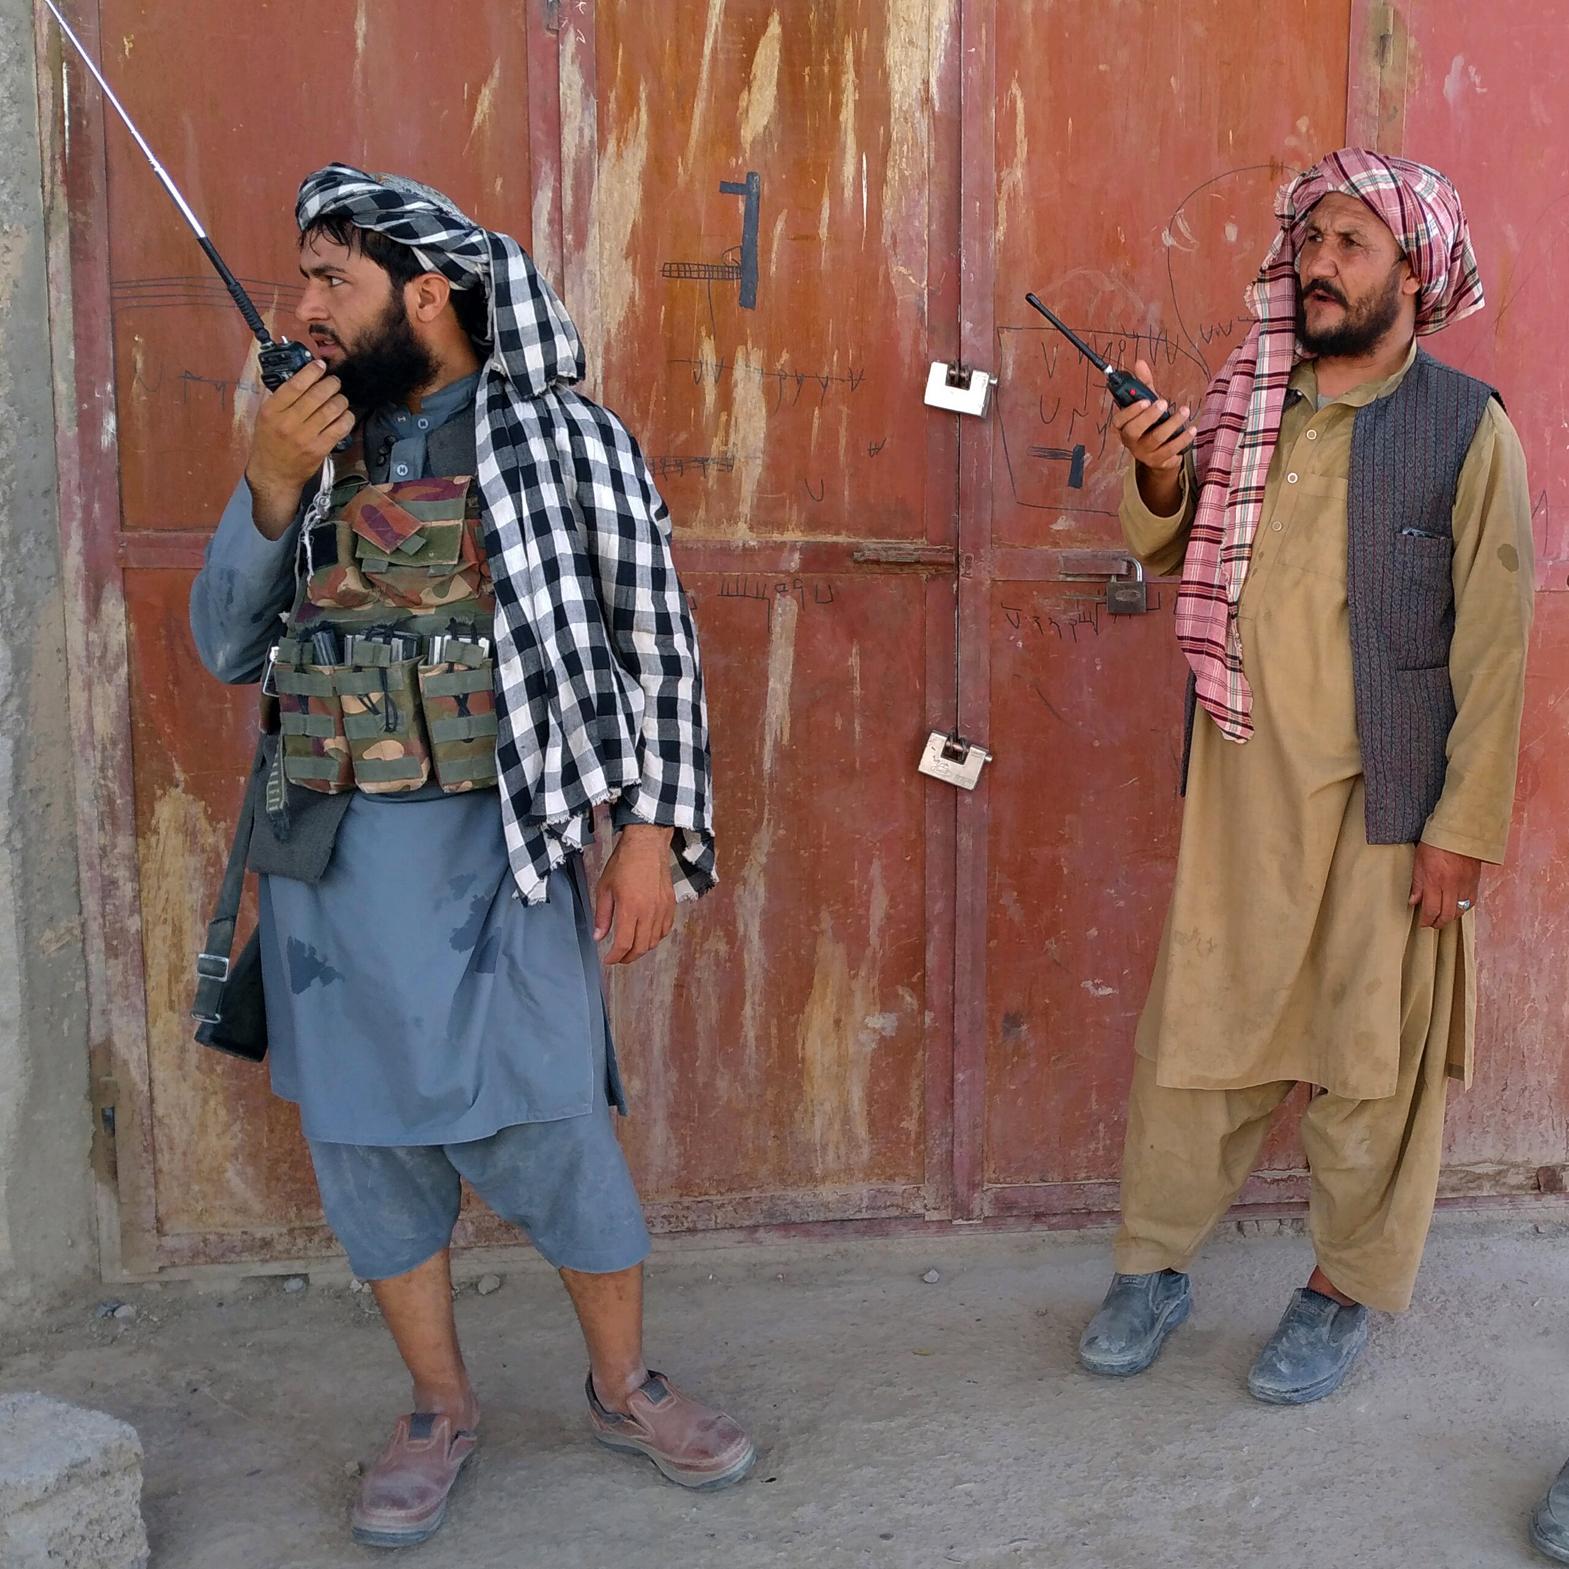 Potential Al Qaeda resurgence in Afghanistan worries U.S. officials